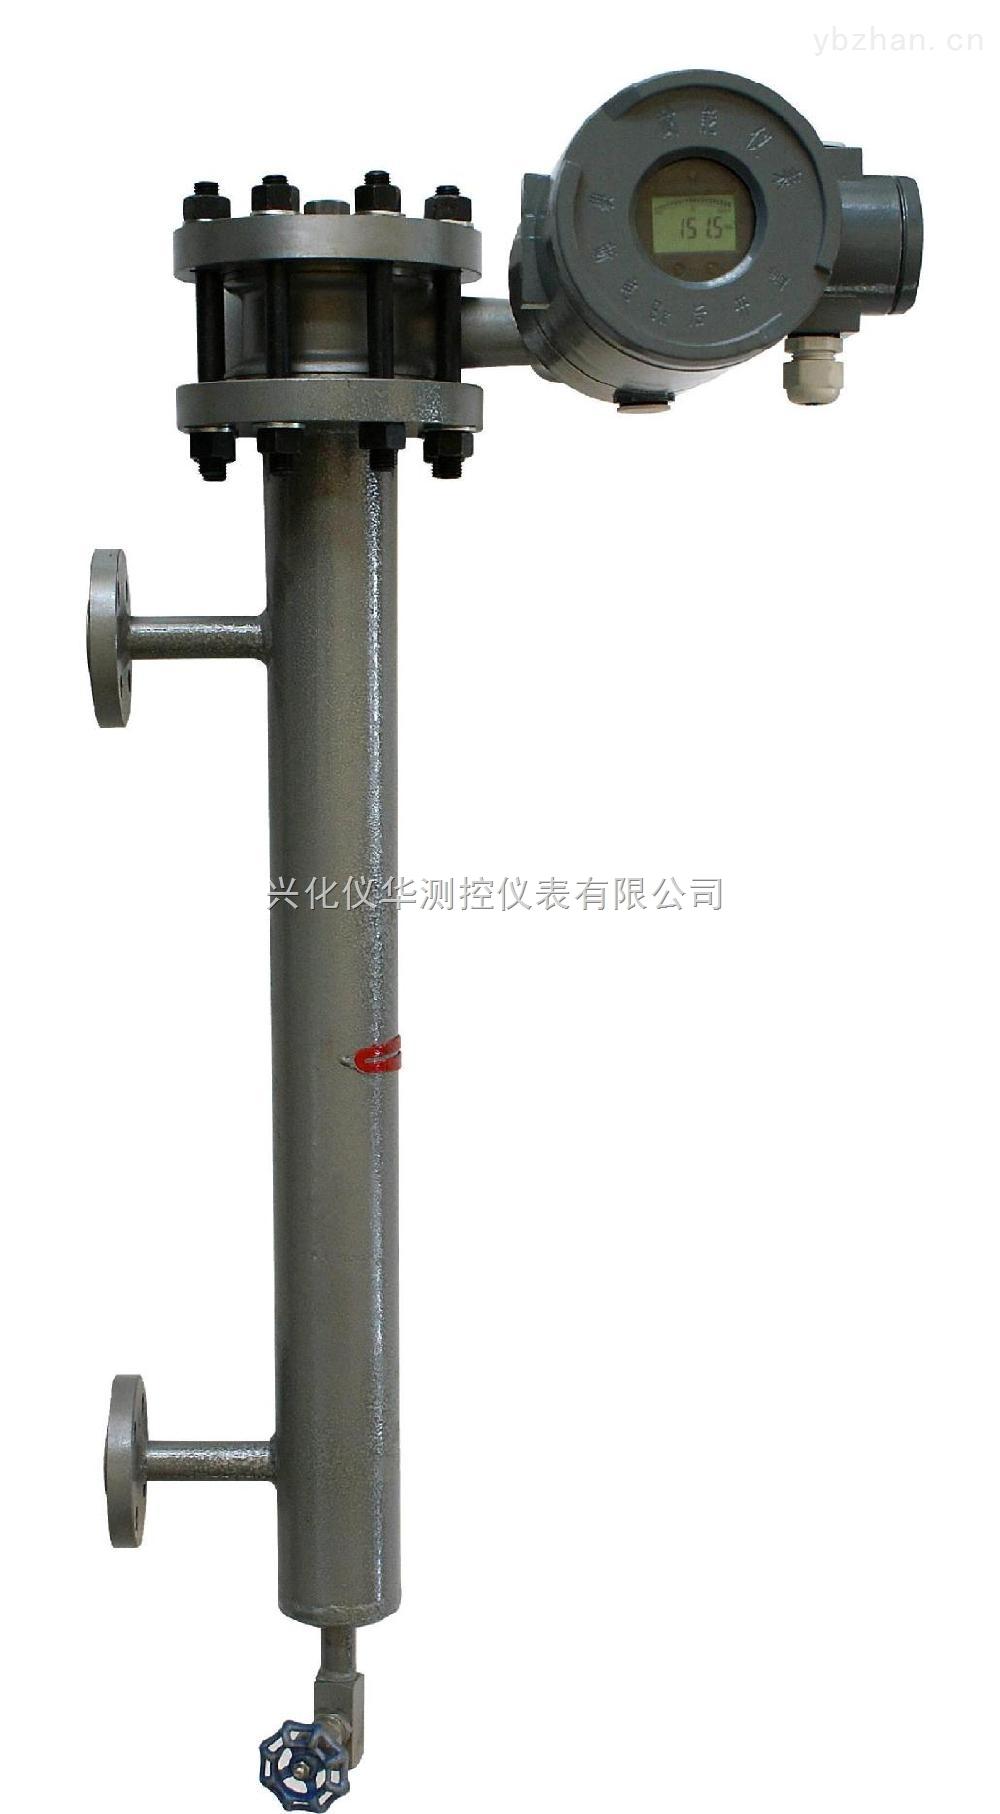 UTD-LP电动浮筒液位计_电动浮筒液位计价格_电动浮筒液位计批发